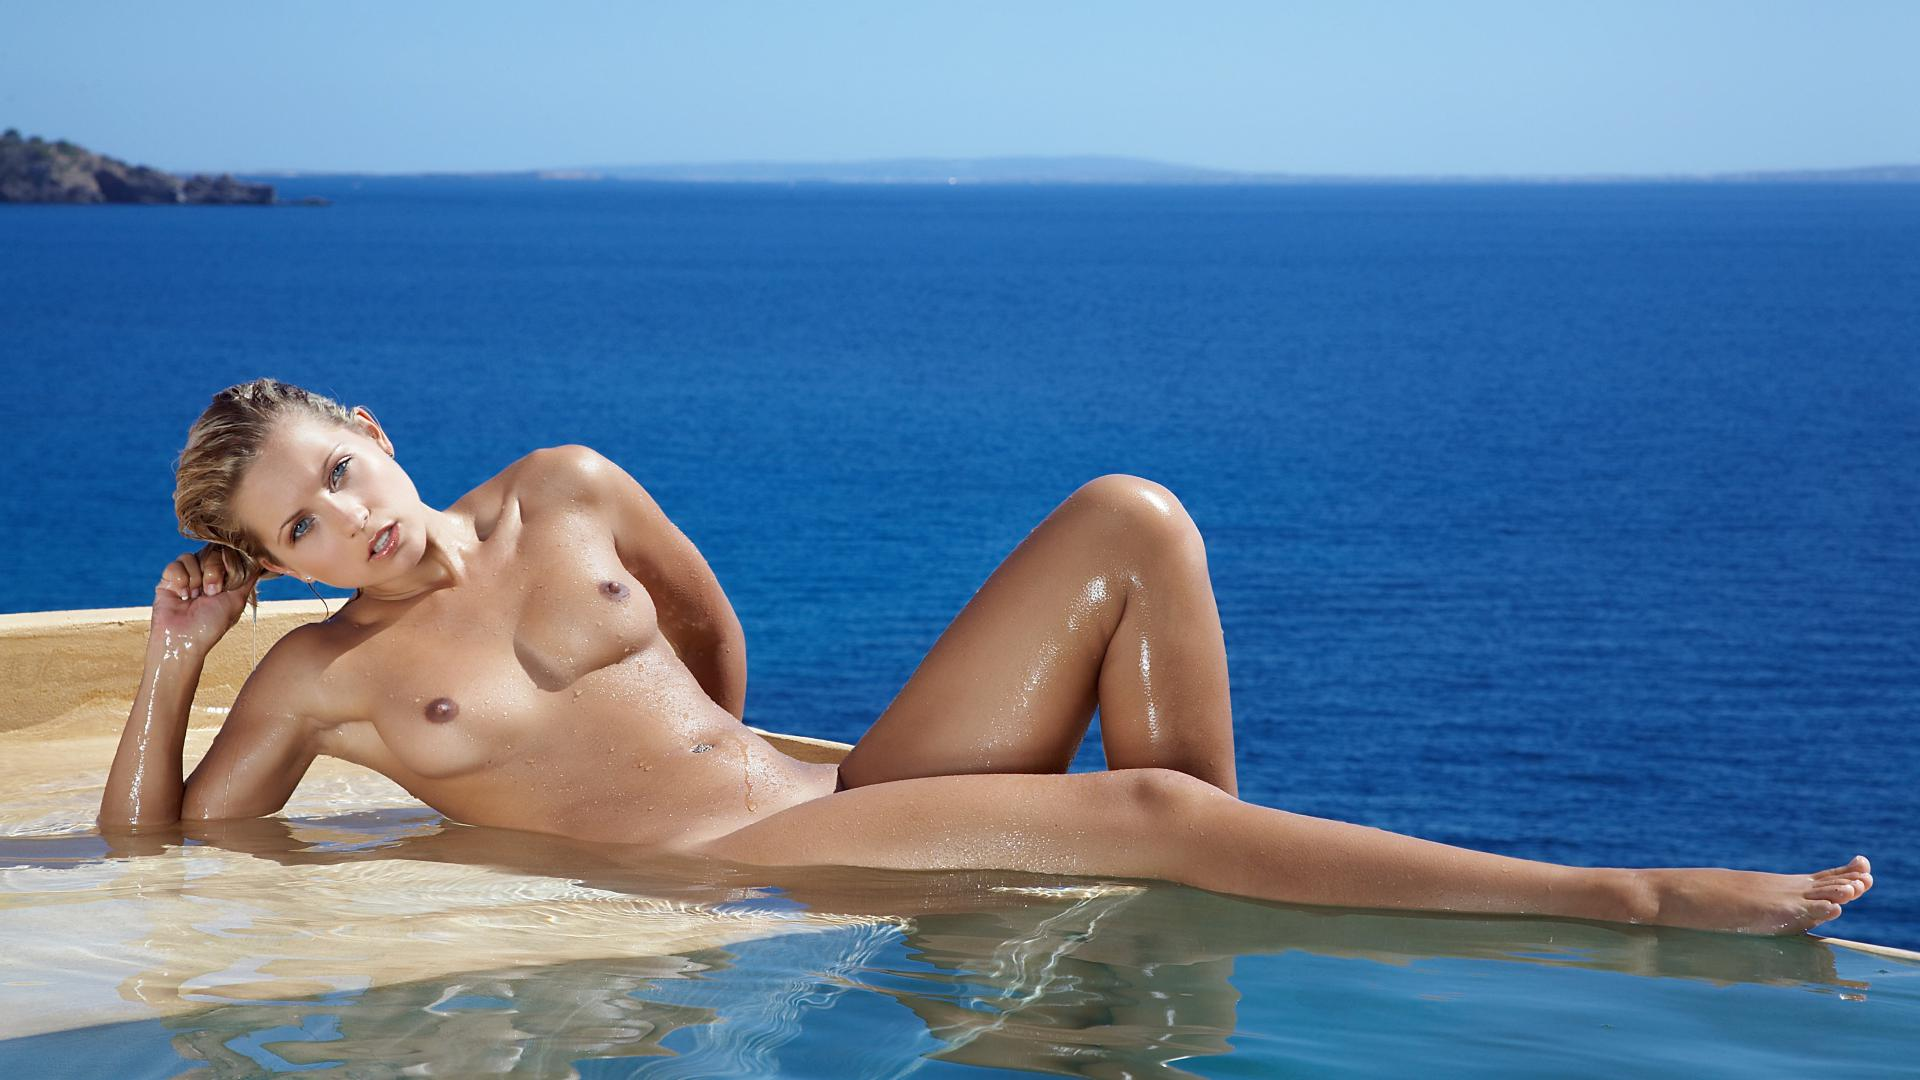 Things, Nude jenni gregg pool mistaken